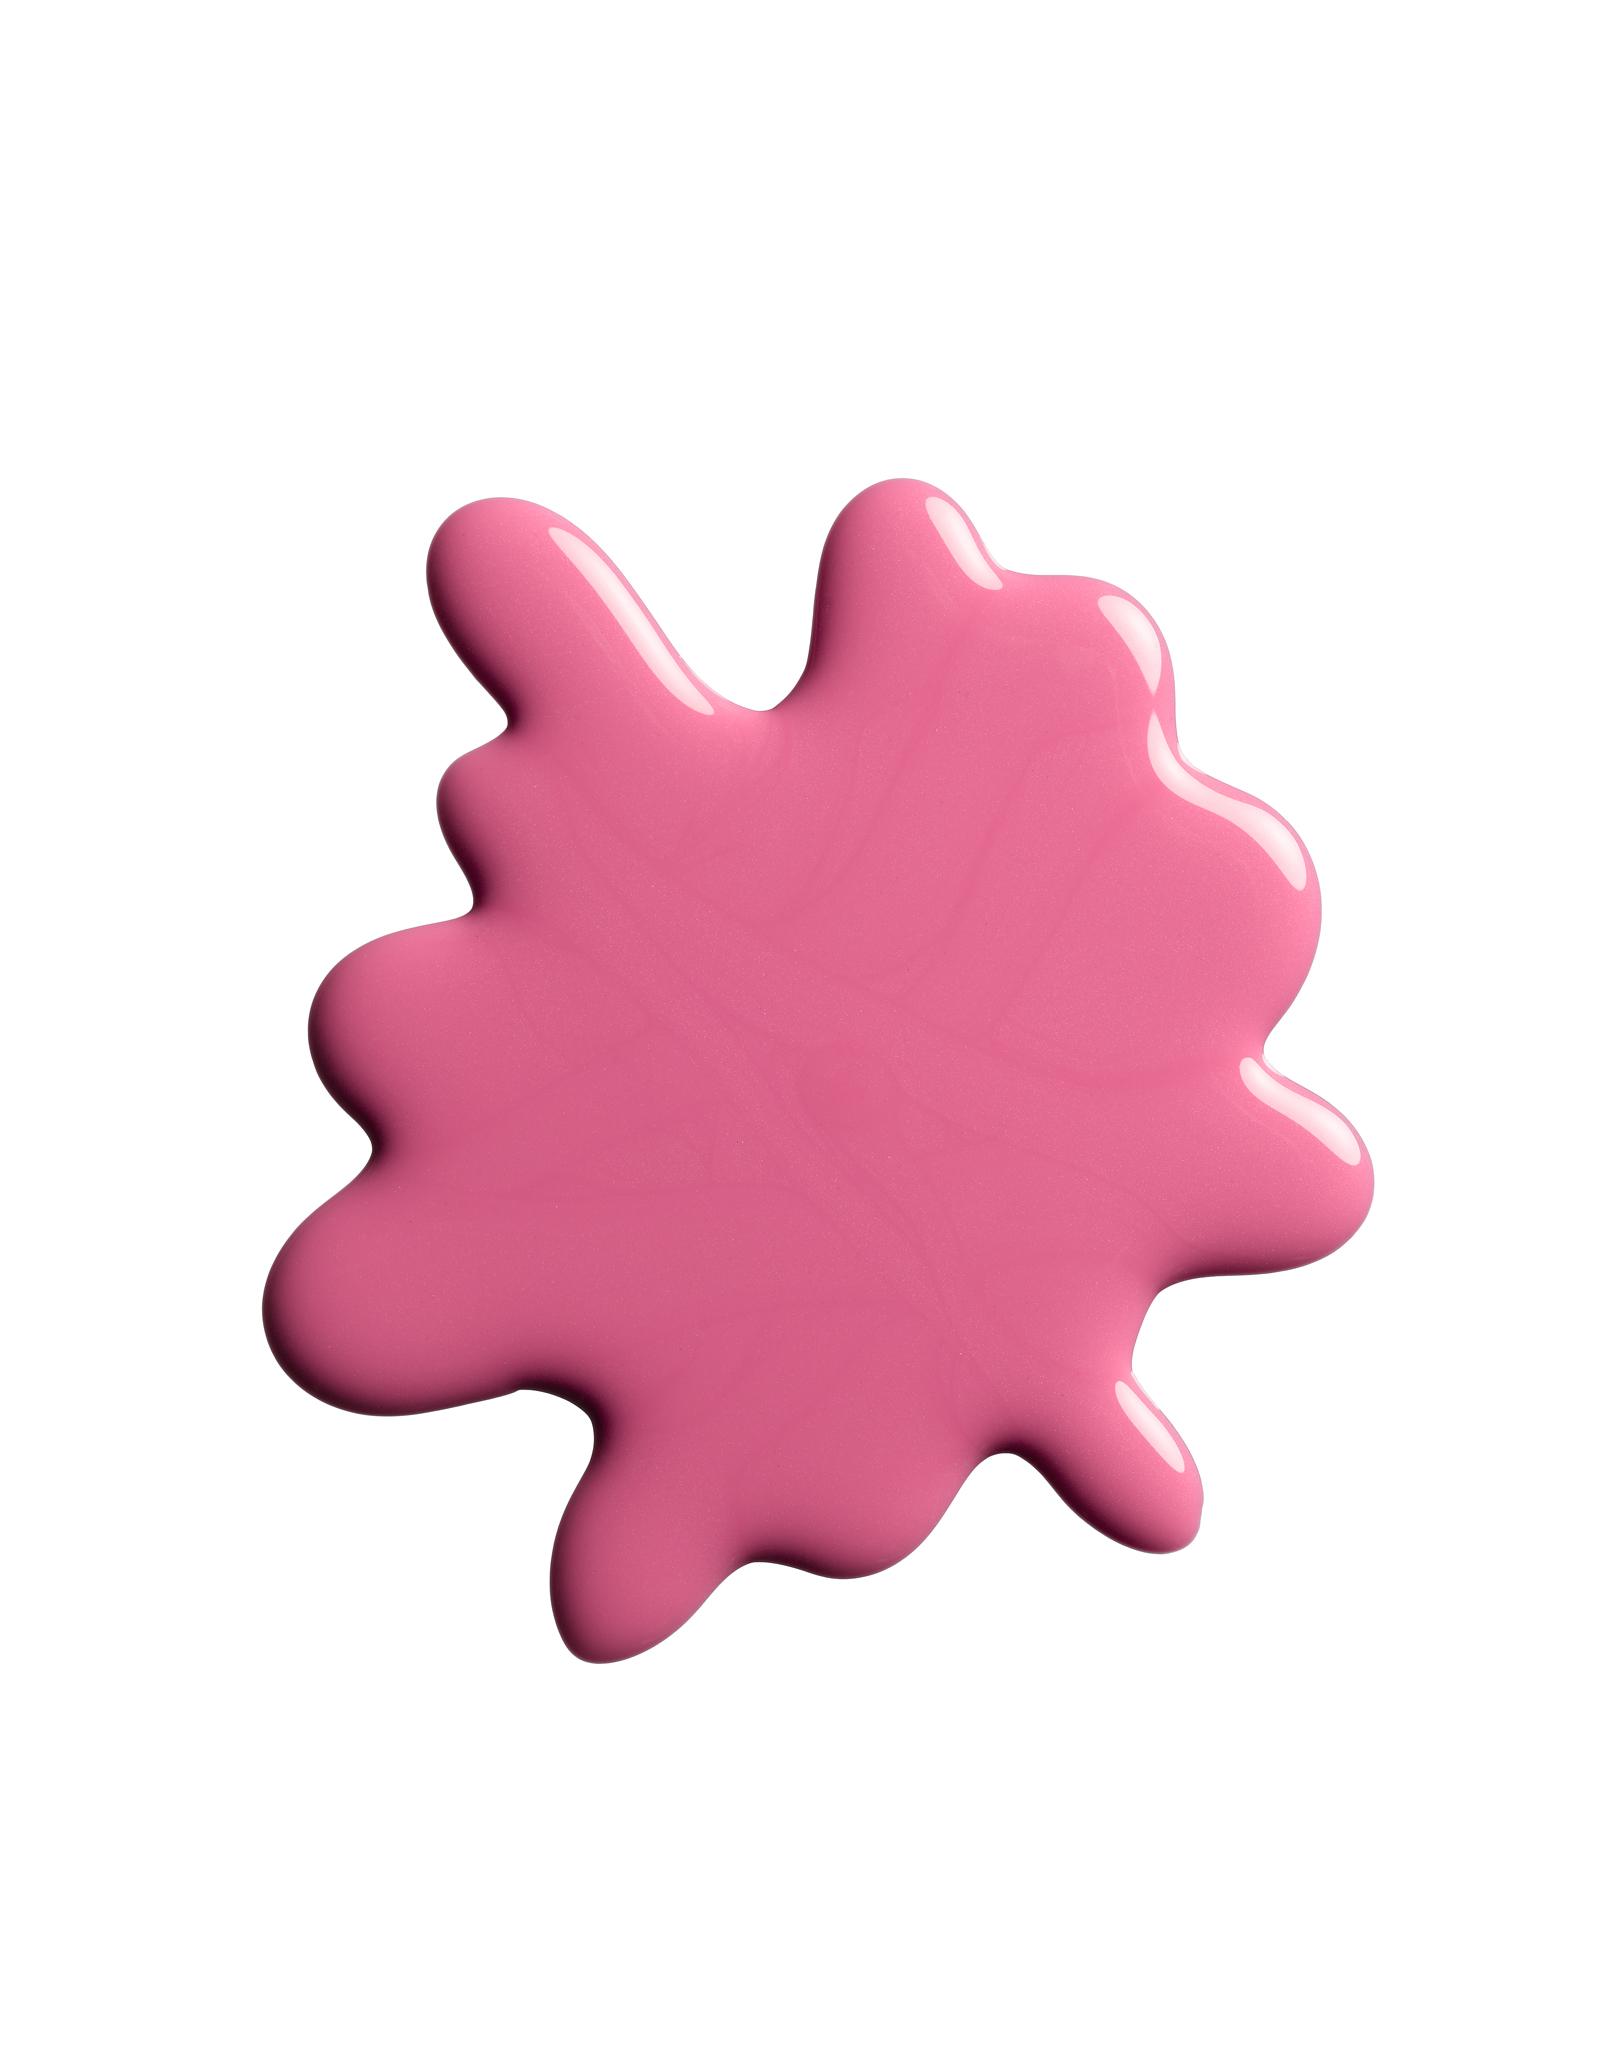 011-0121-ELF fluorescent pink blob 2.jpg